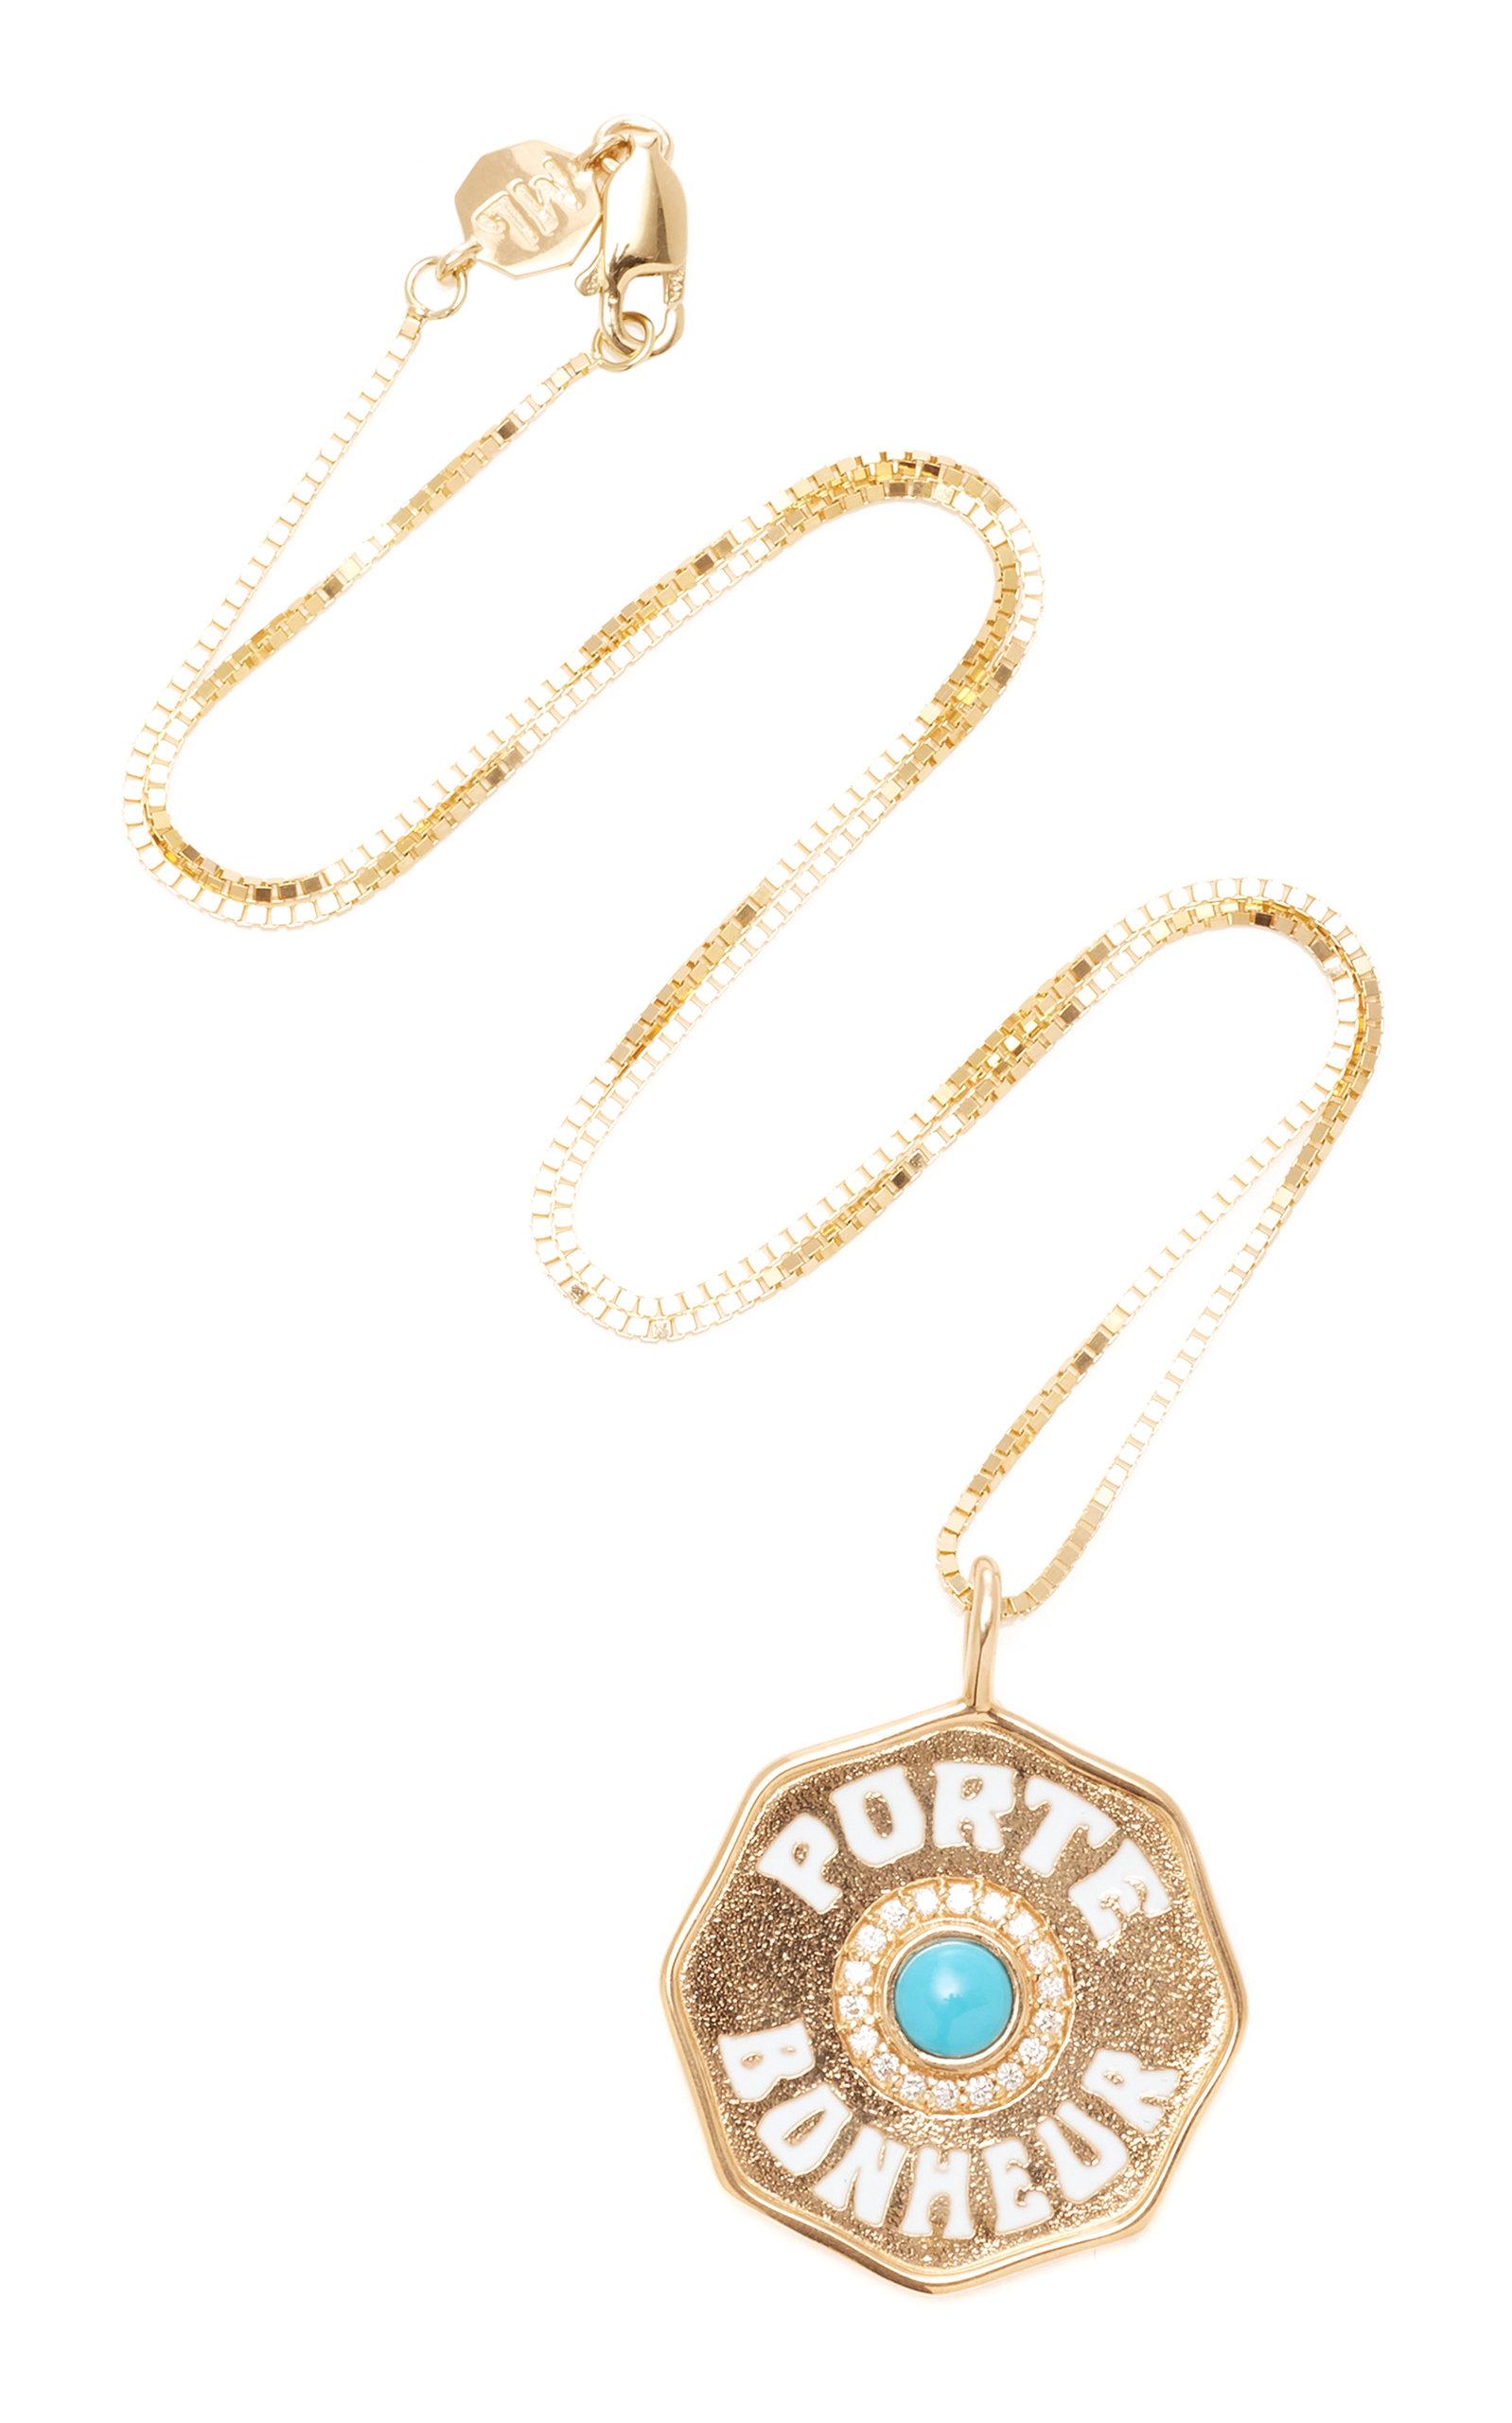 Marlo Laz Porte Boneheur 14K Gold Necklace 261KpAIWl